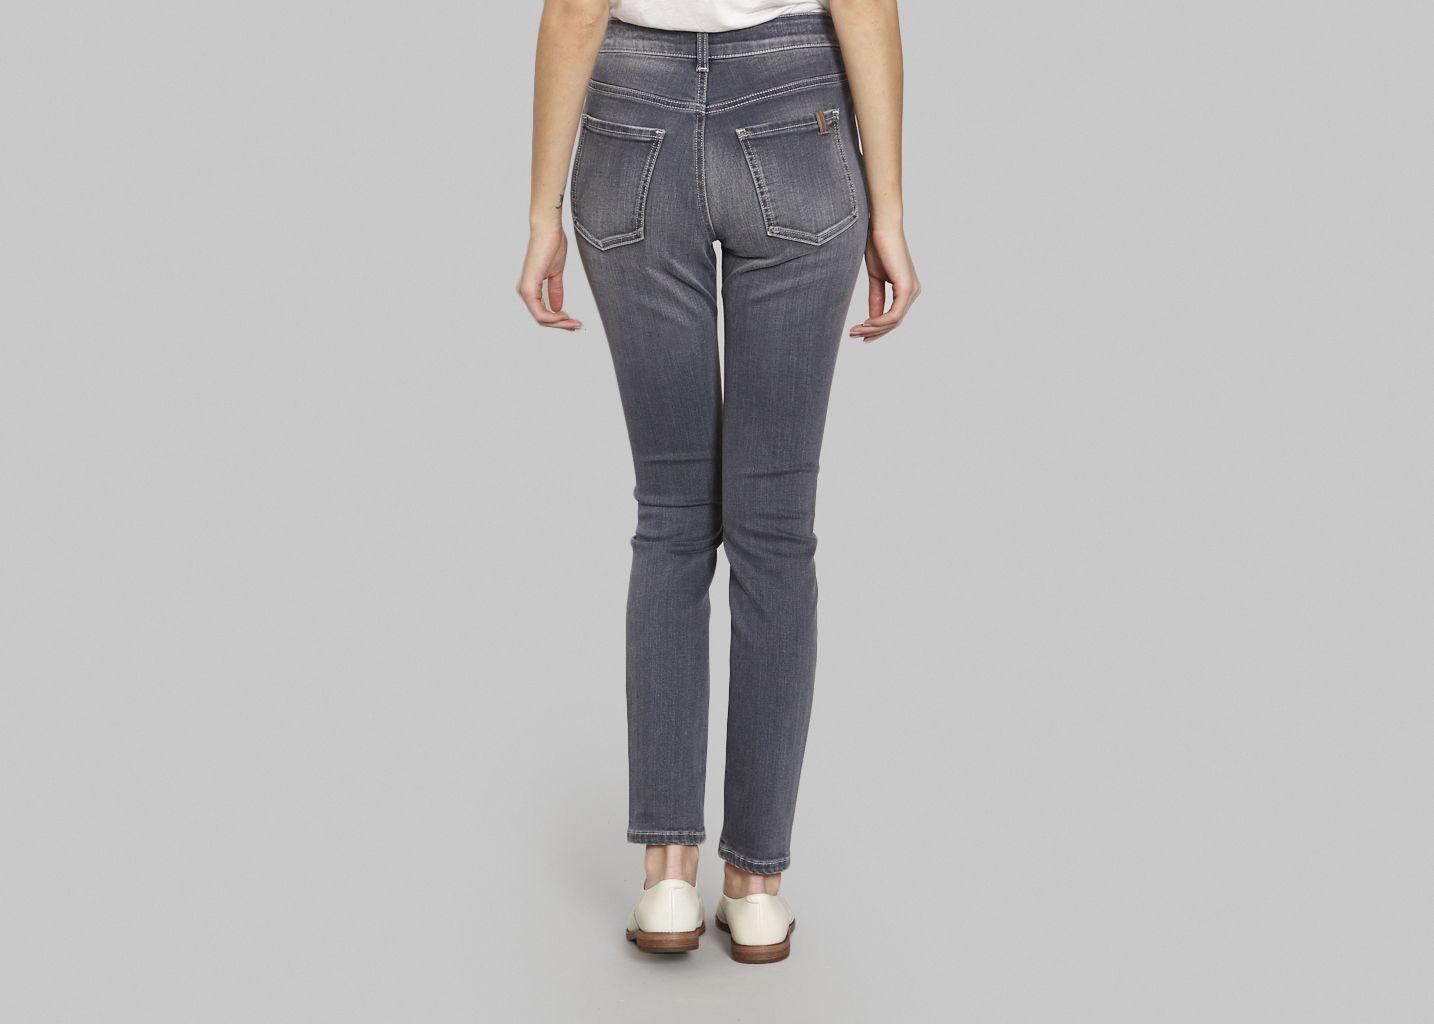 Jean Bamboo Skinny High Waist - Atelier Notify